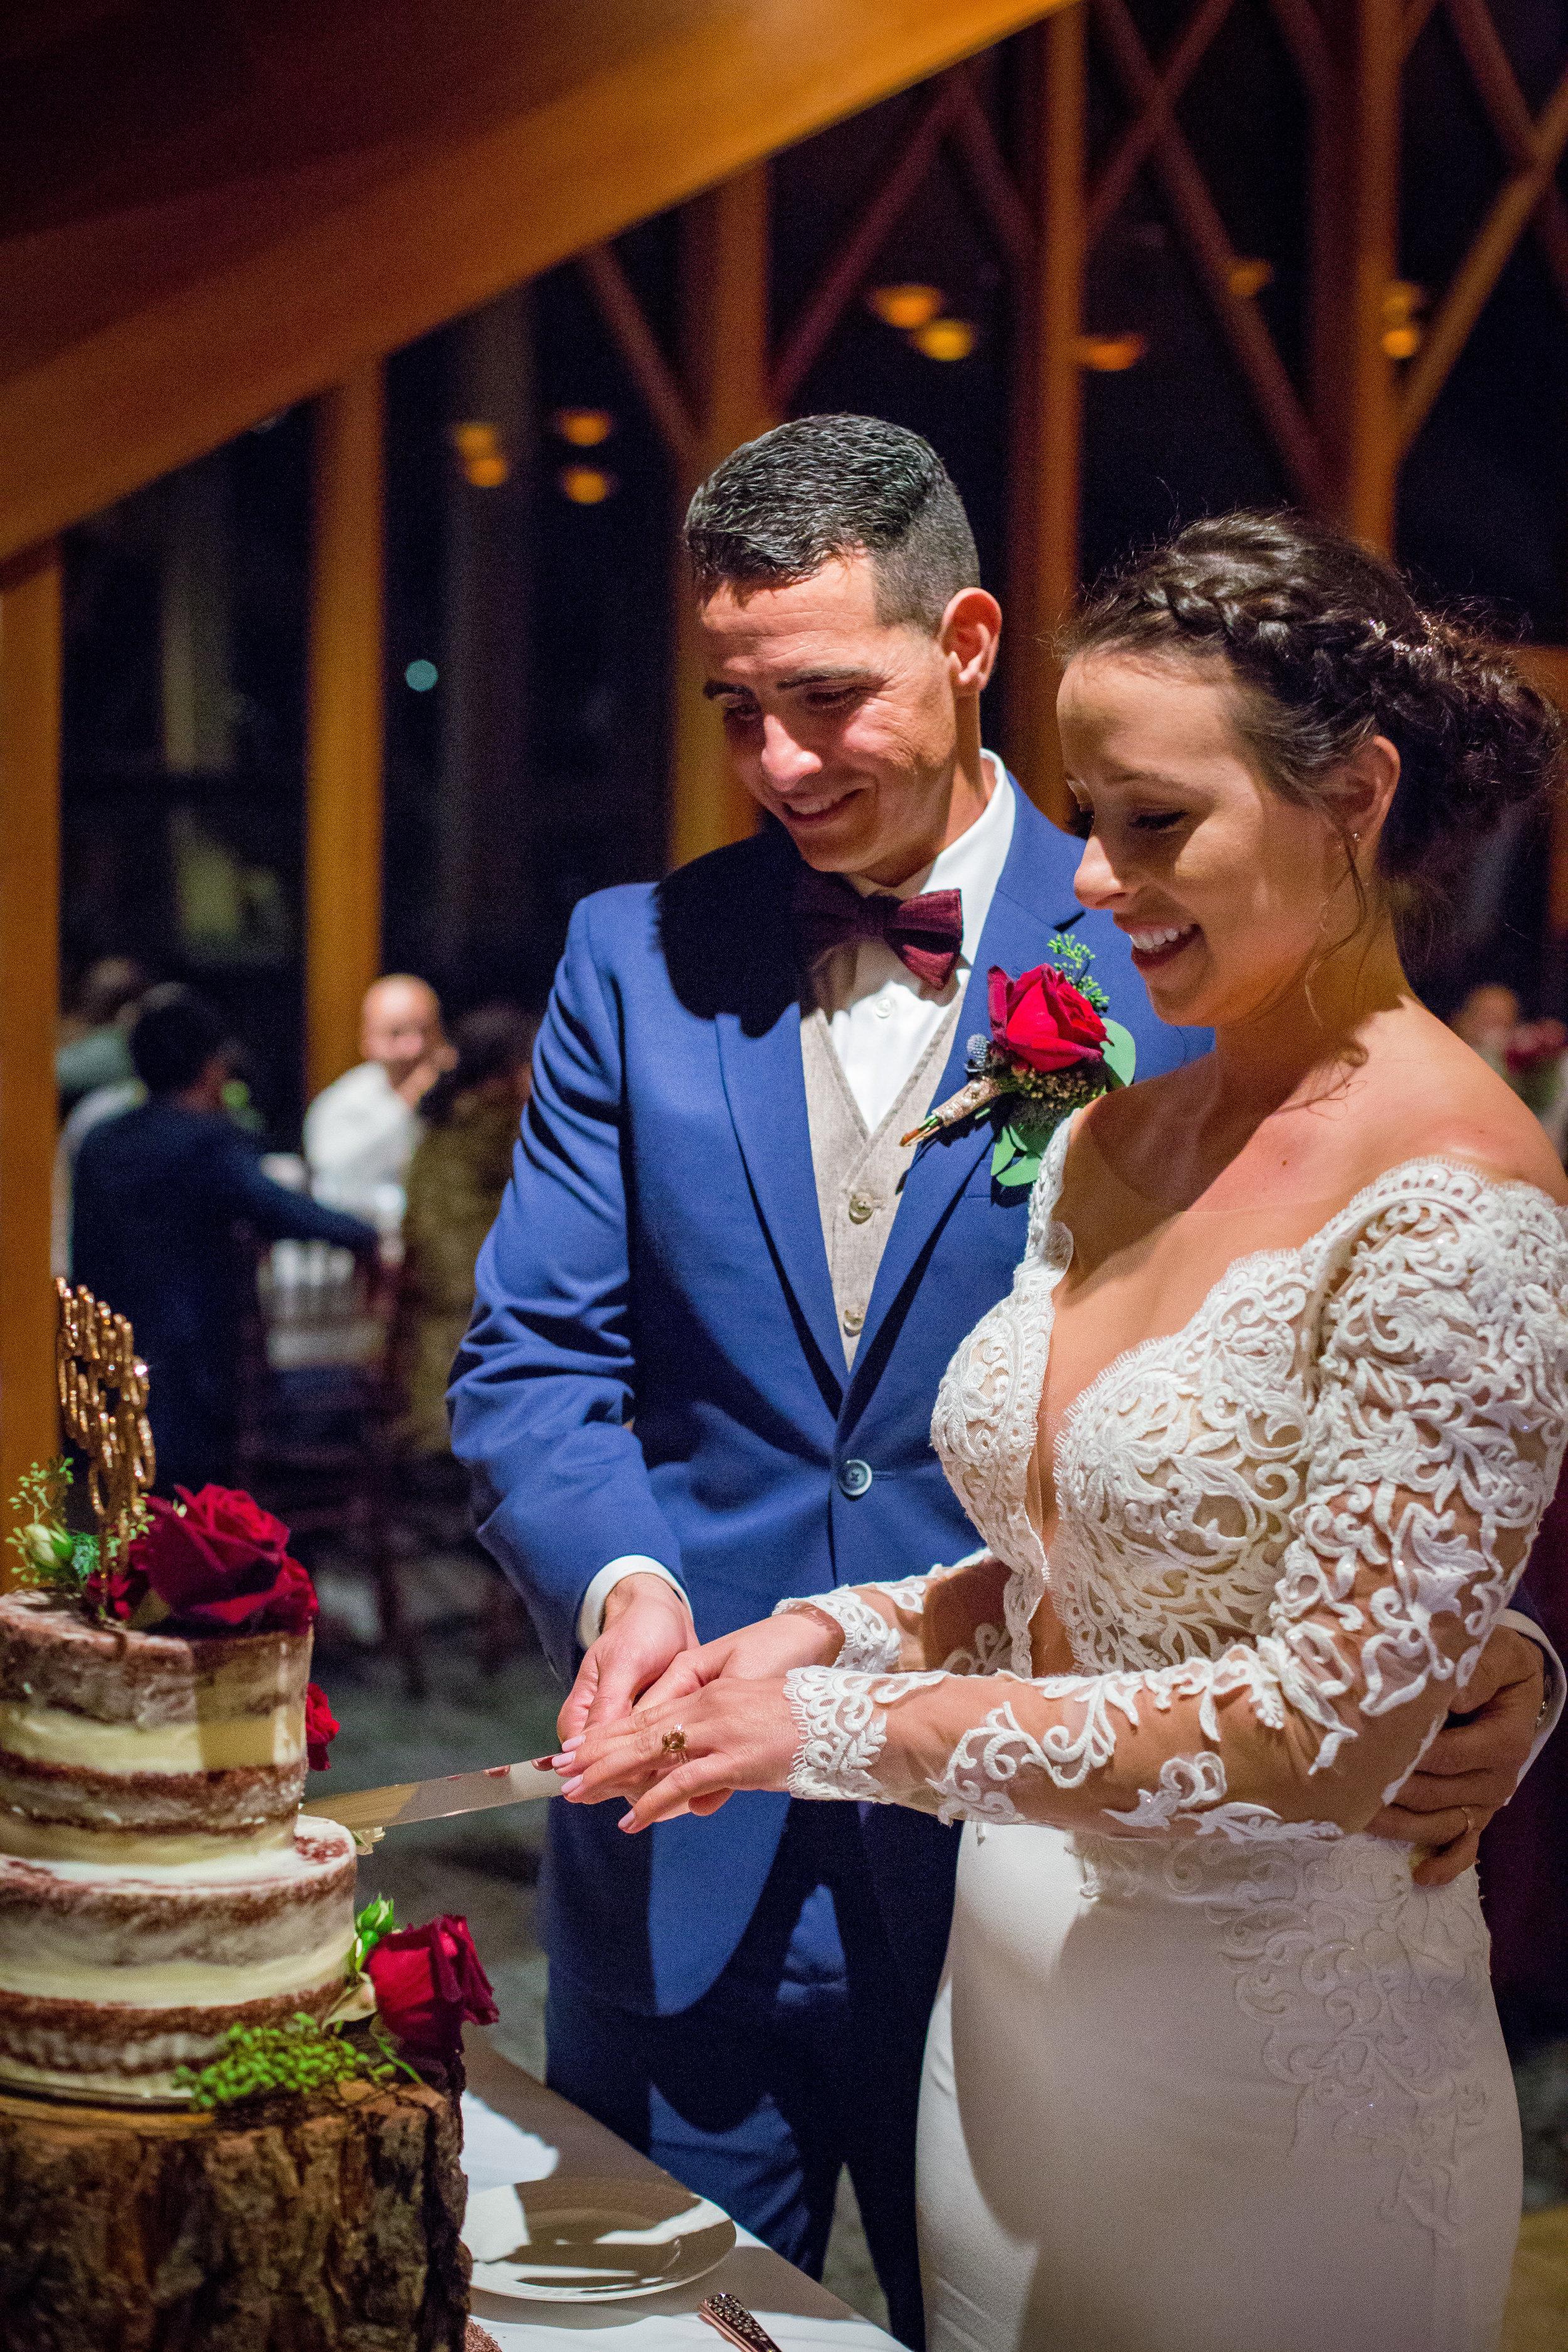 2 Britni & Dennis - Edgewood Tahoe - Sacramento Wedding Photographer - Ashley Teasley Photography-49.JPG